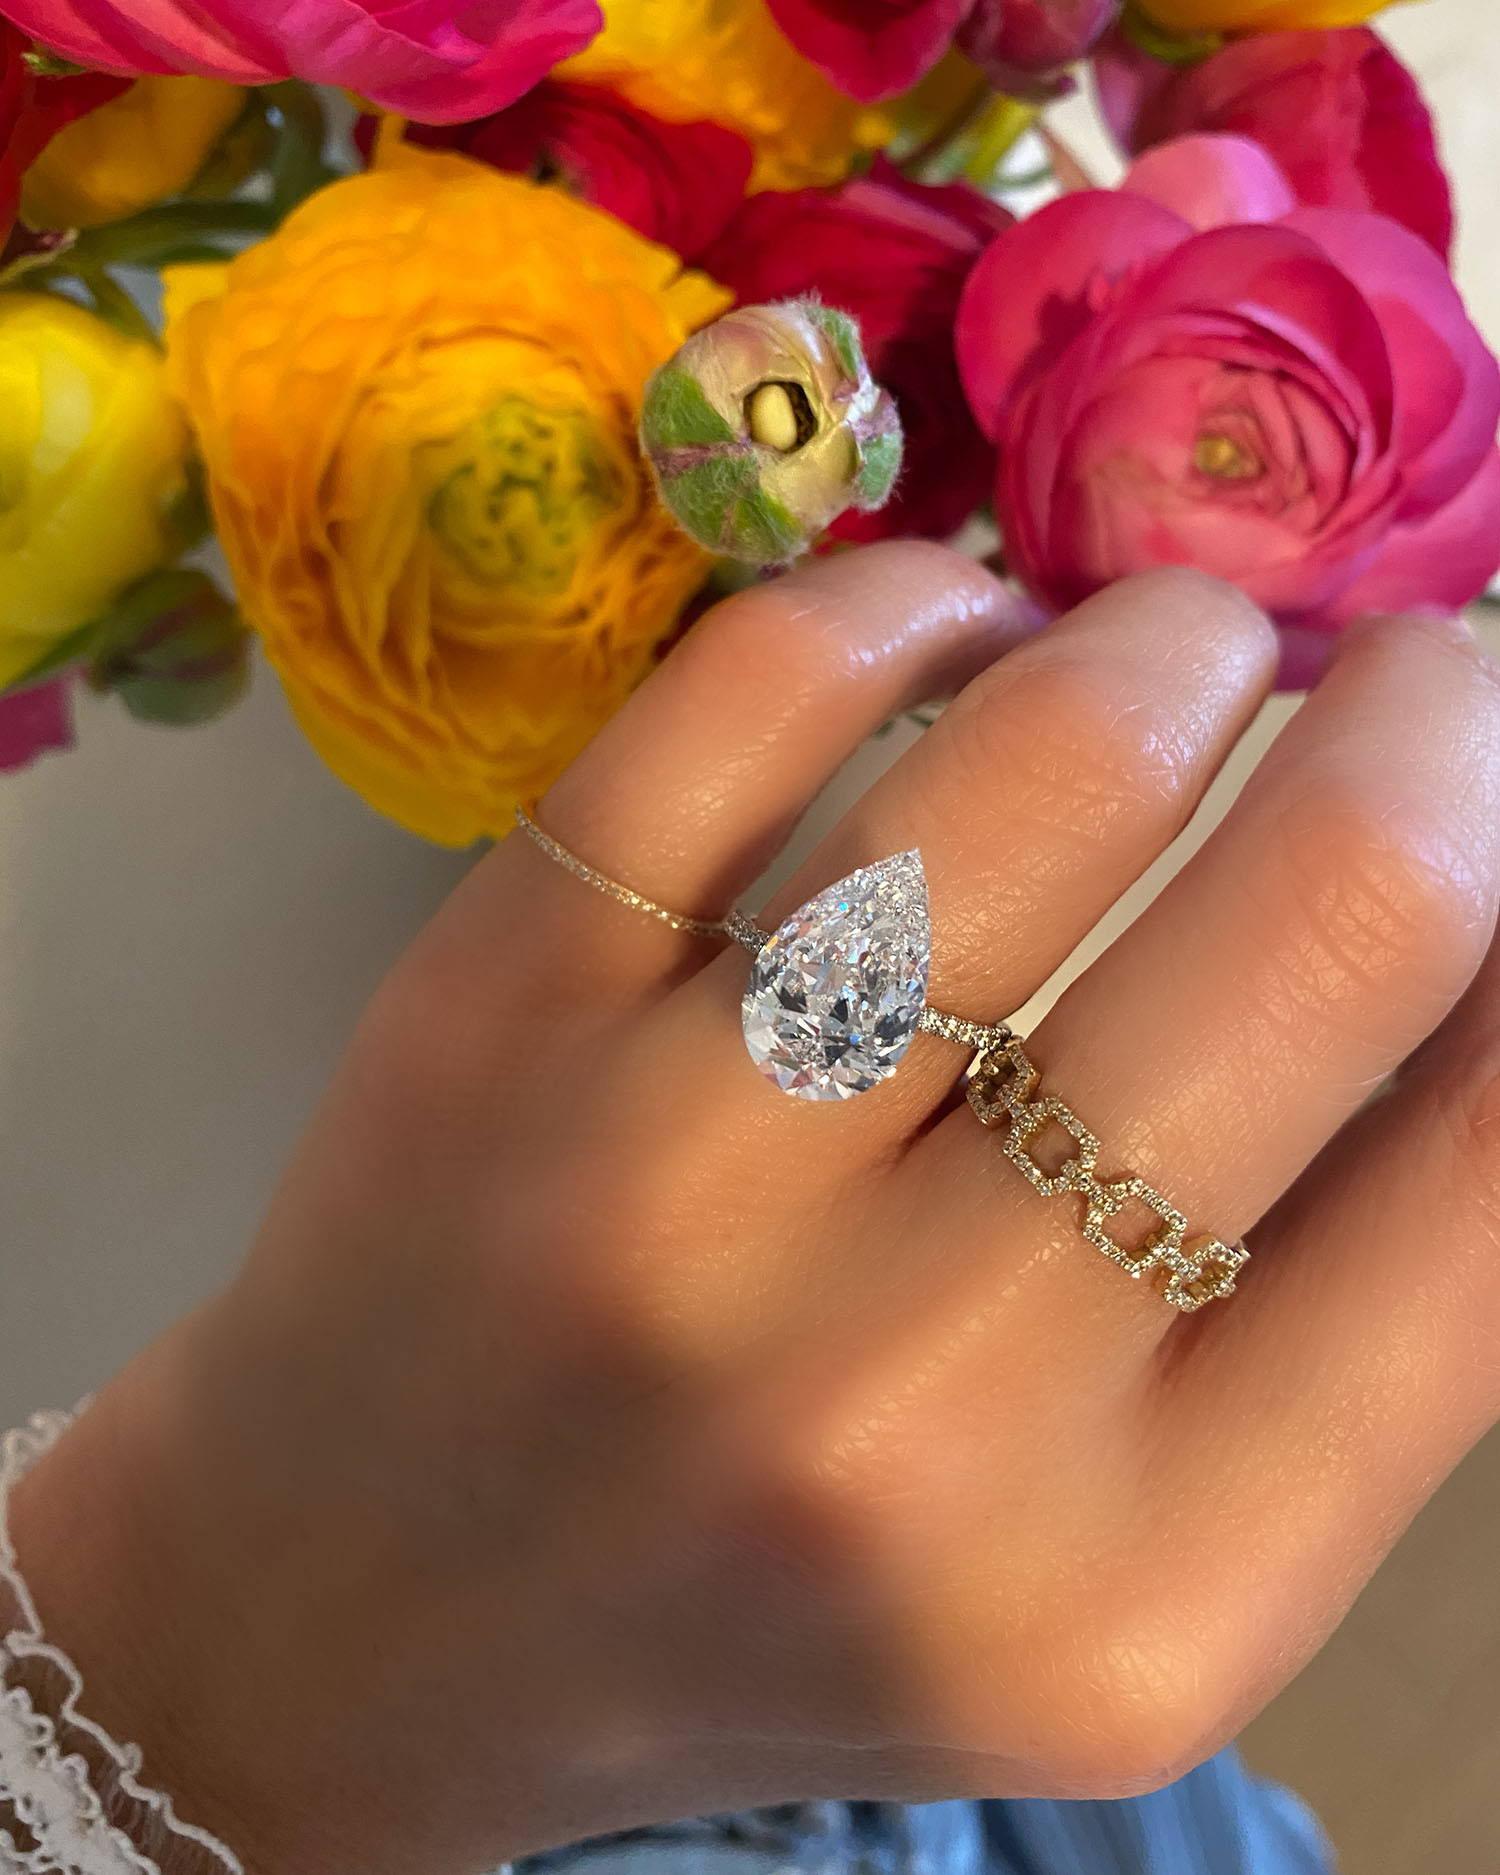 Miss Diamond Ring 5 Carat 6 Carat Pear Marquise Diamond Engagement Ring